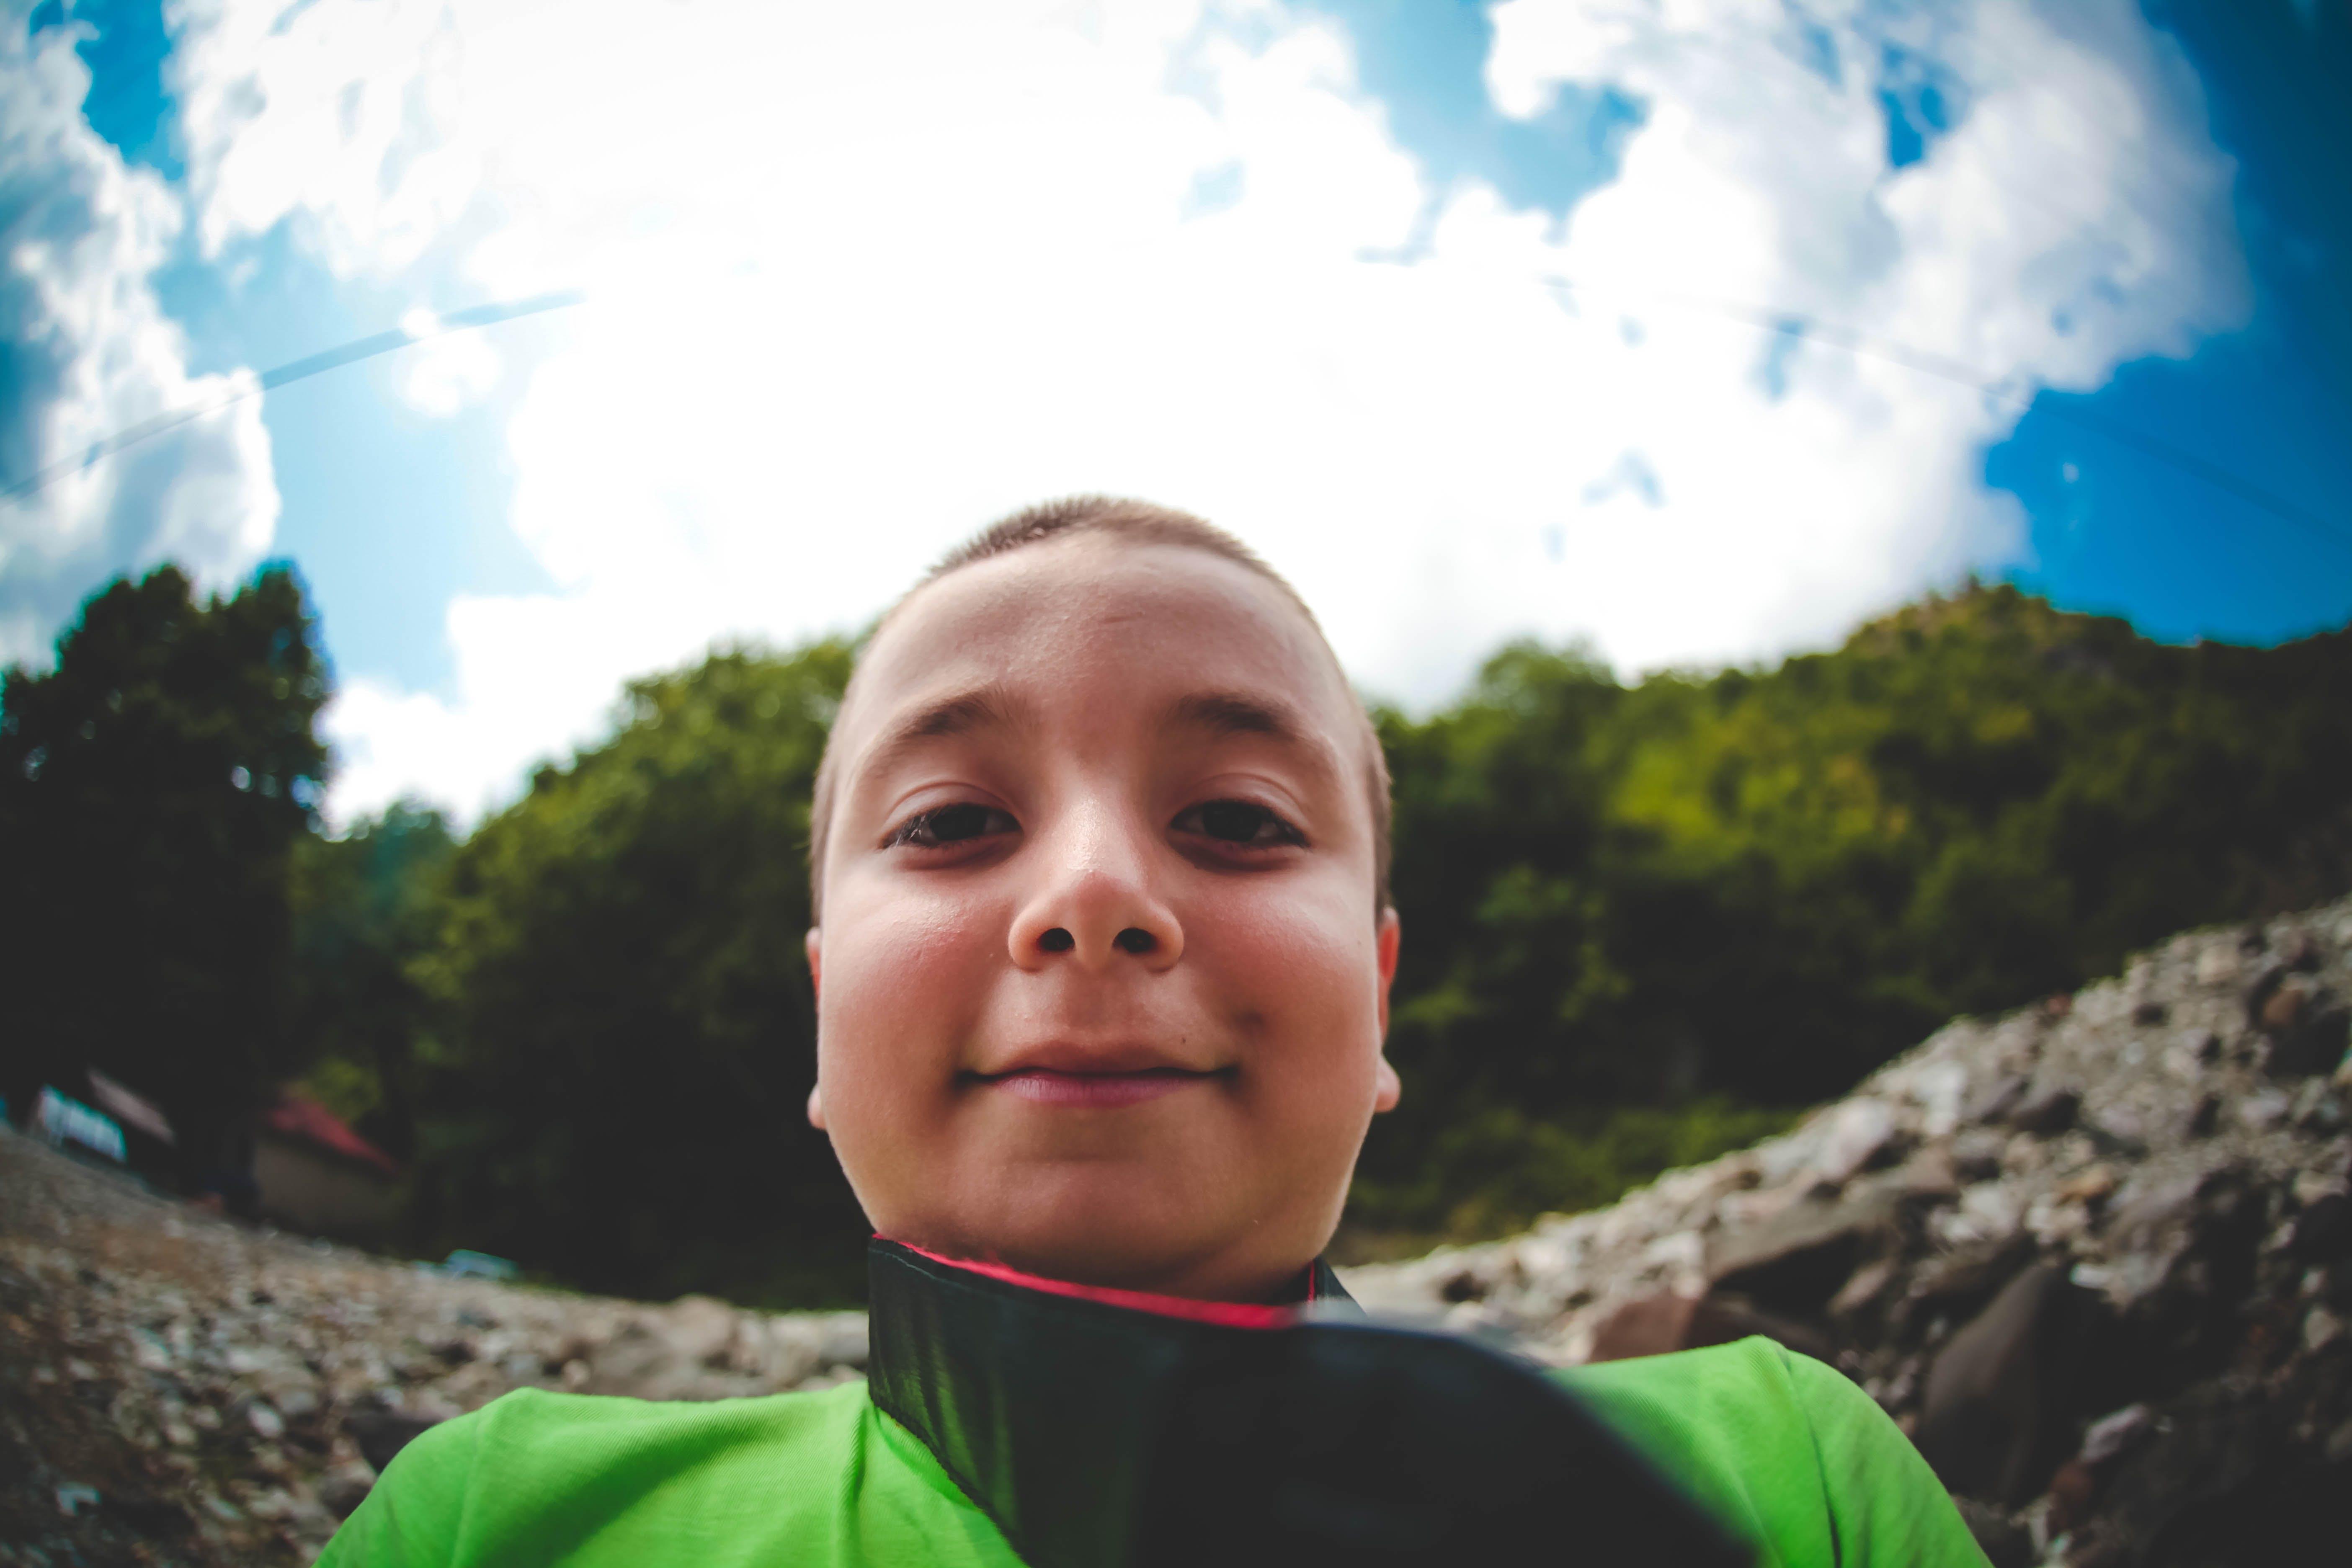 Free stock photo of chil, child, crazy selfie, selfie